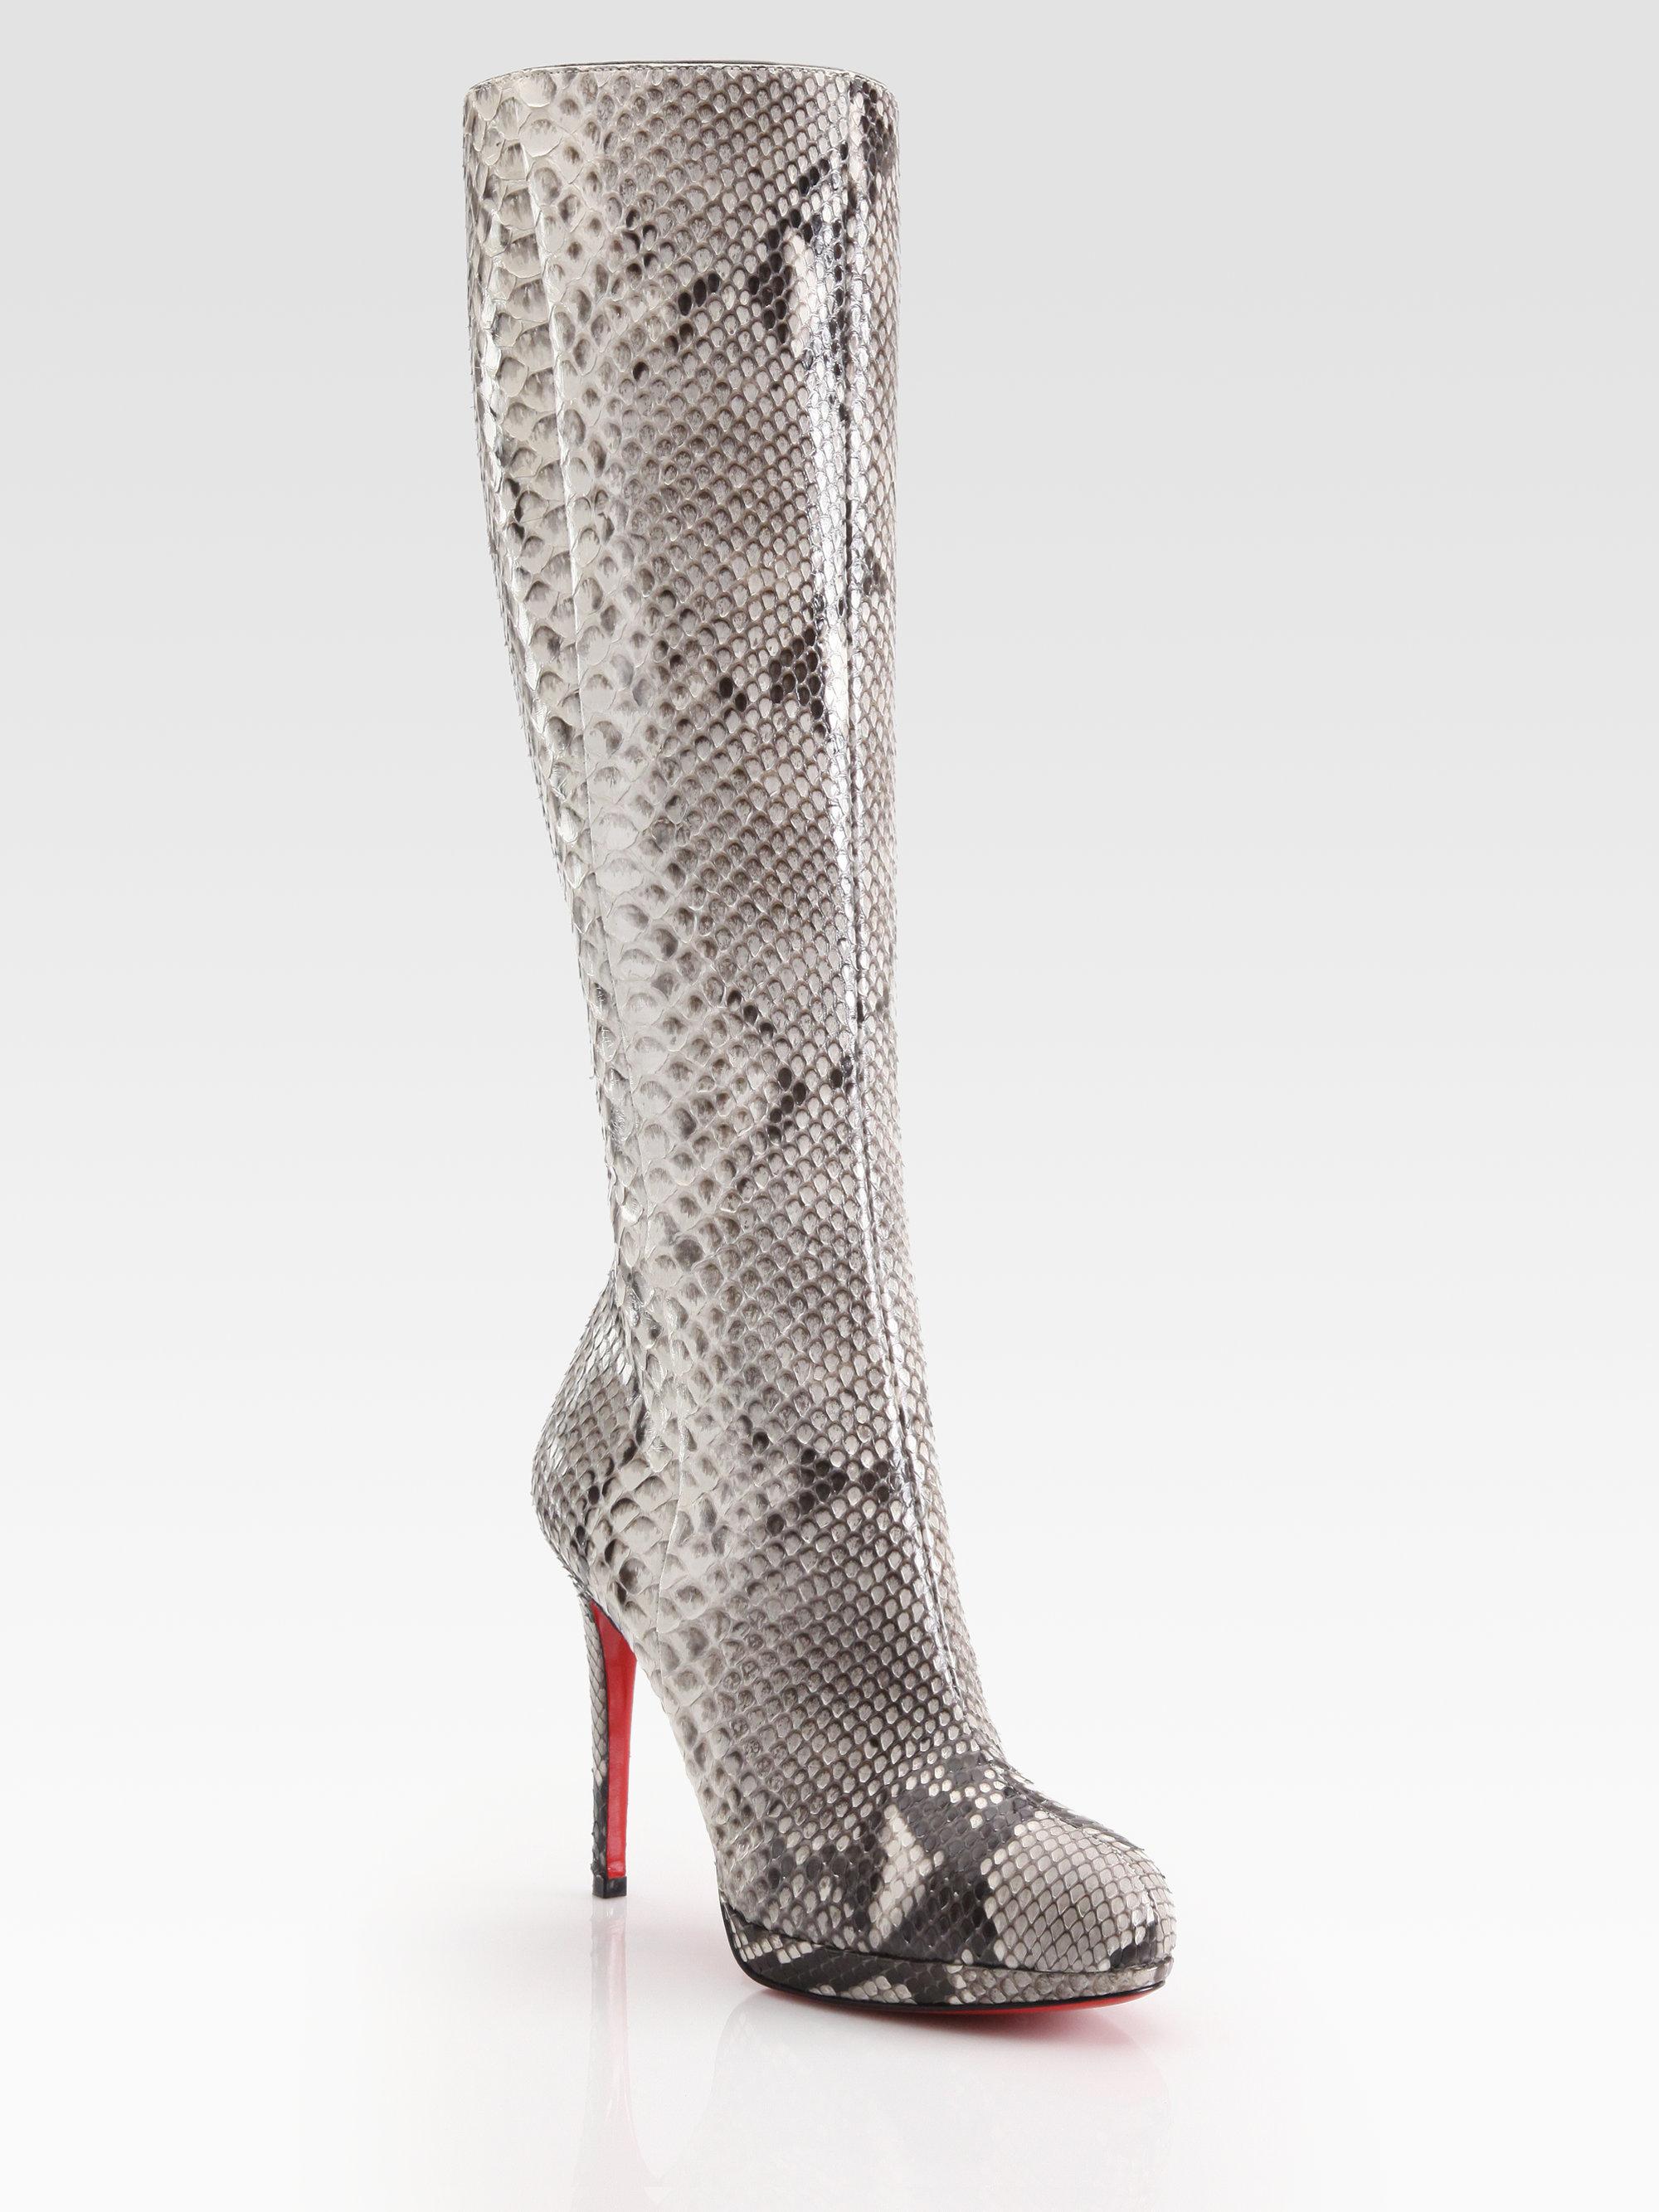 louboutin crocodile boots